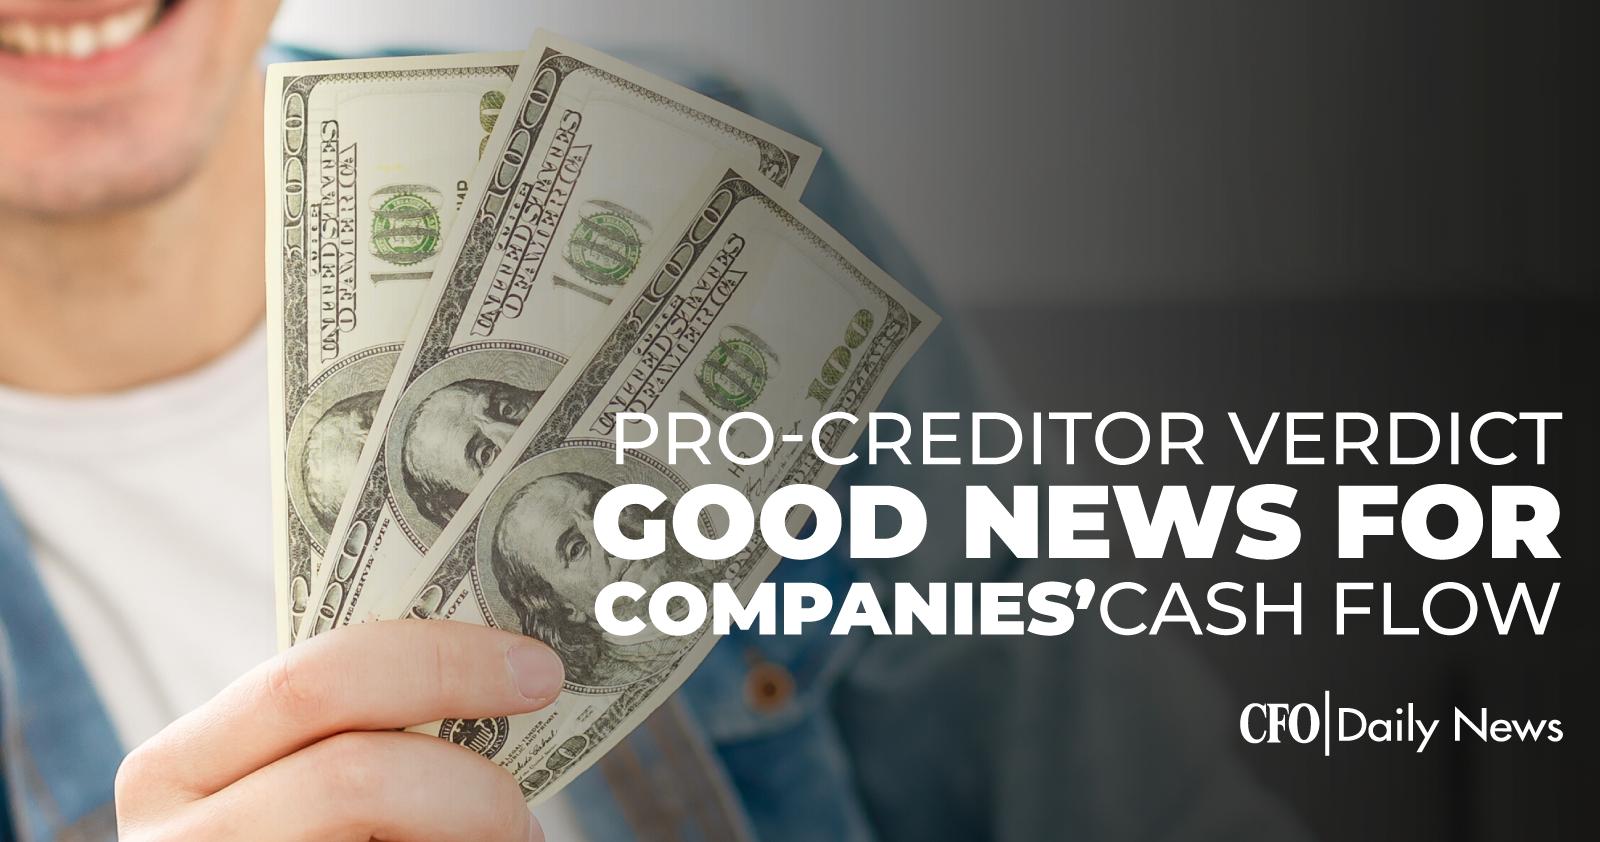 pro-creditor verdict good news for companies cash flow